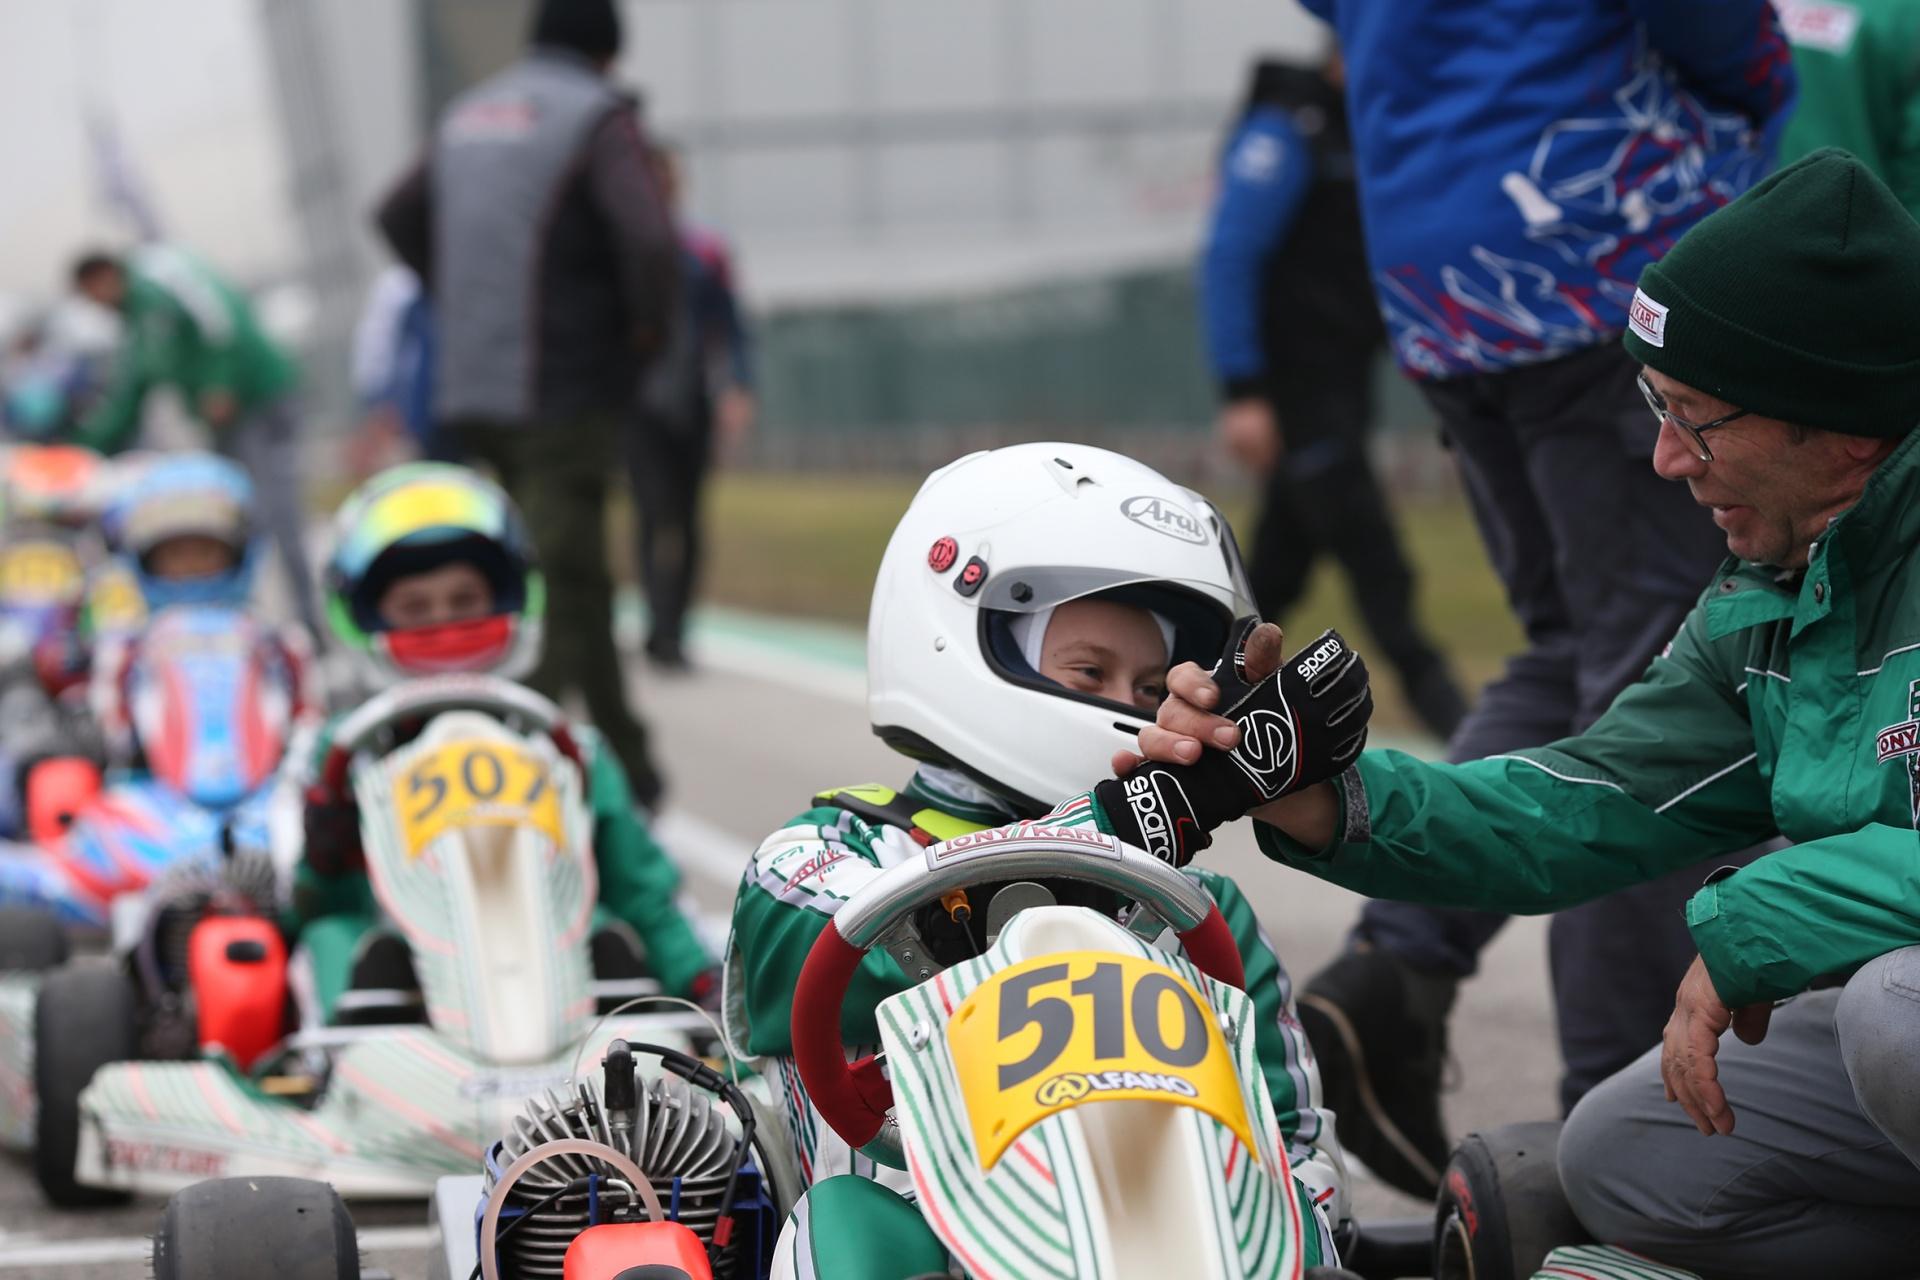 Good first run for Gamoto Kart at the Adria Karting Raceway